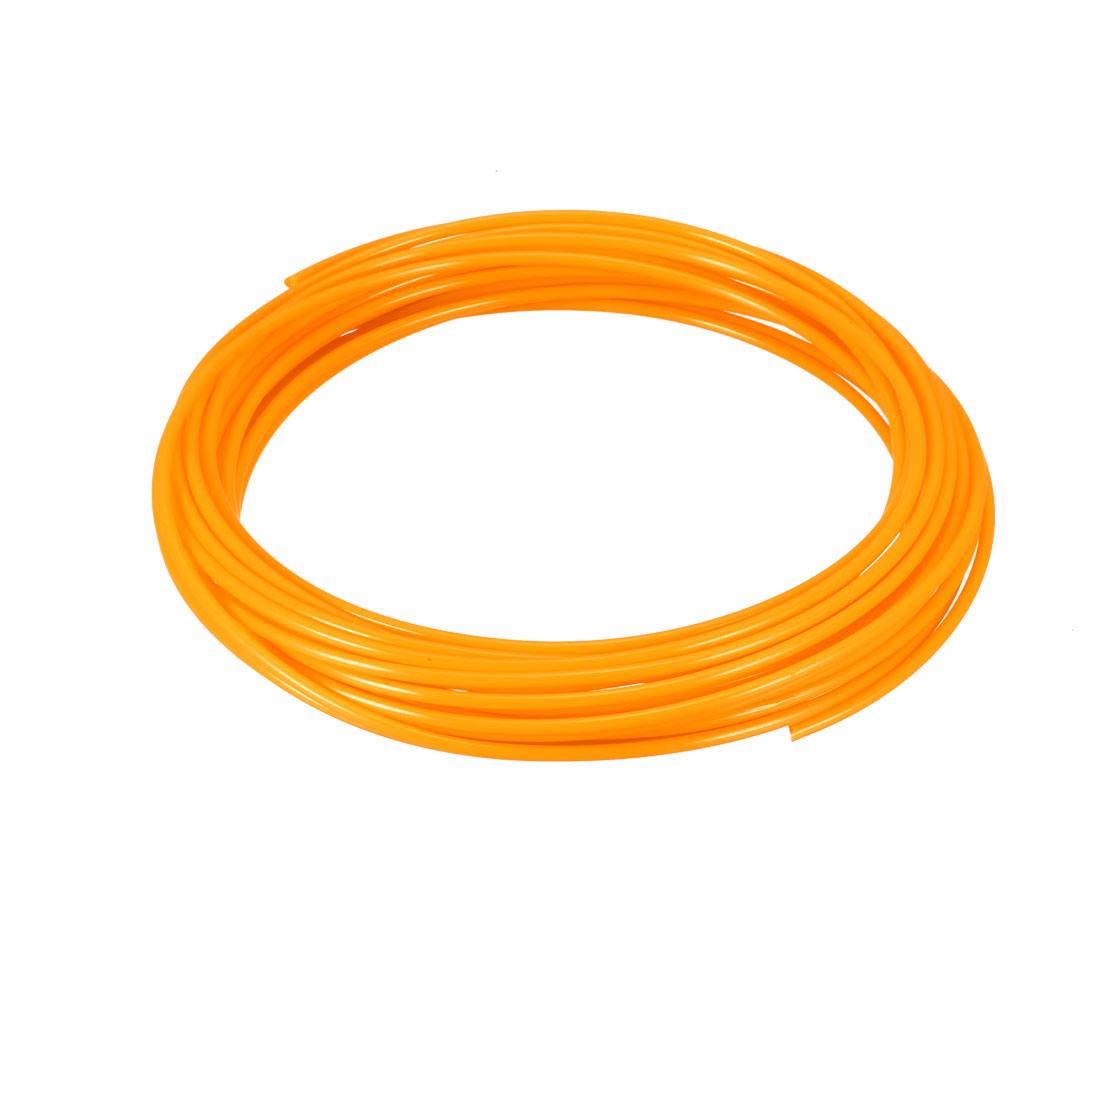 5 Meter/16 Ft ABS 3D Pen/3D Printer Filament, 1.75 mm Orange